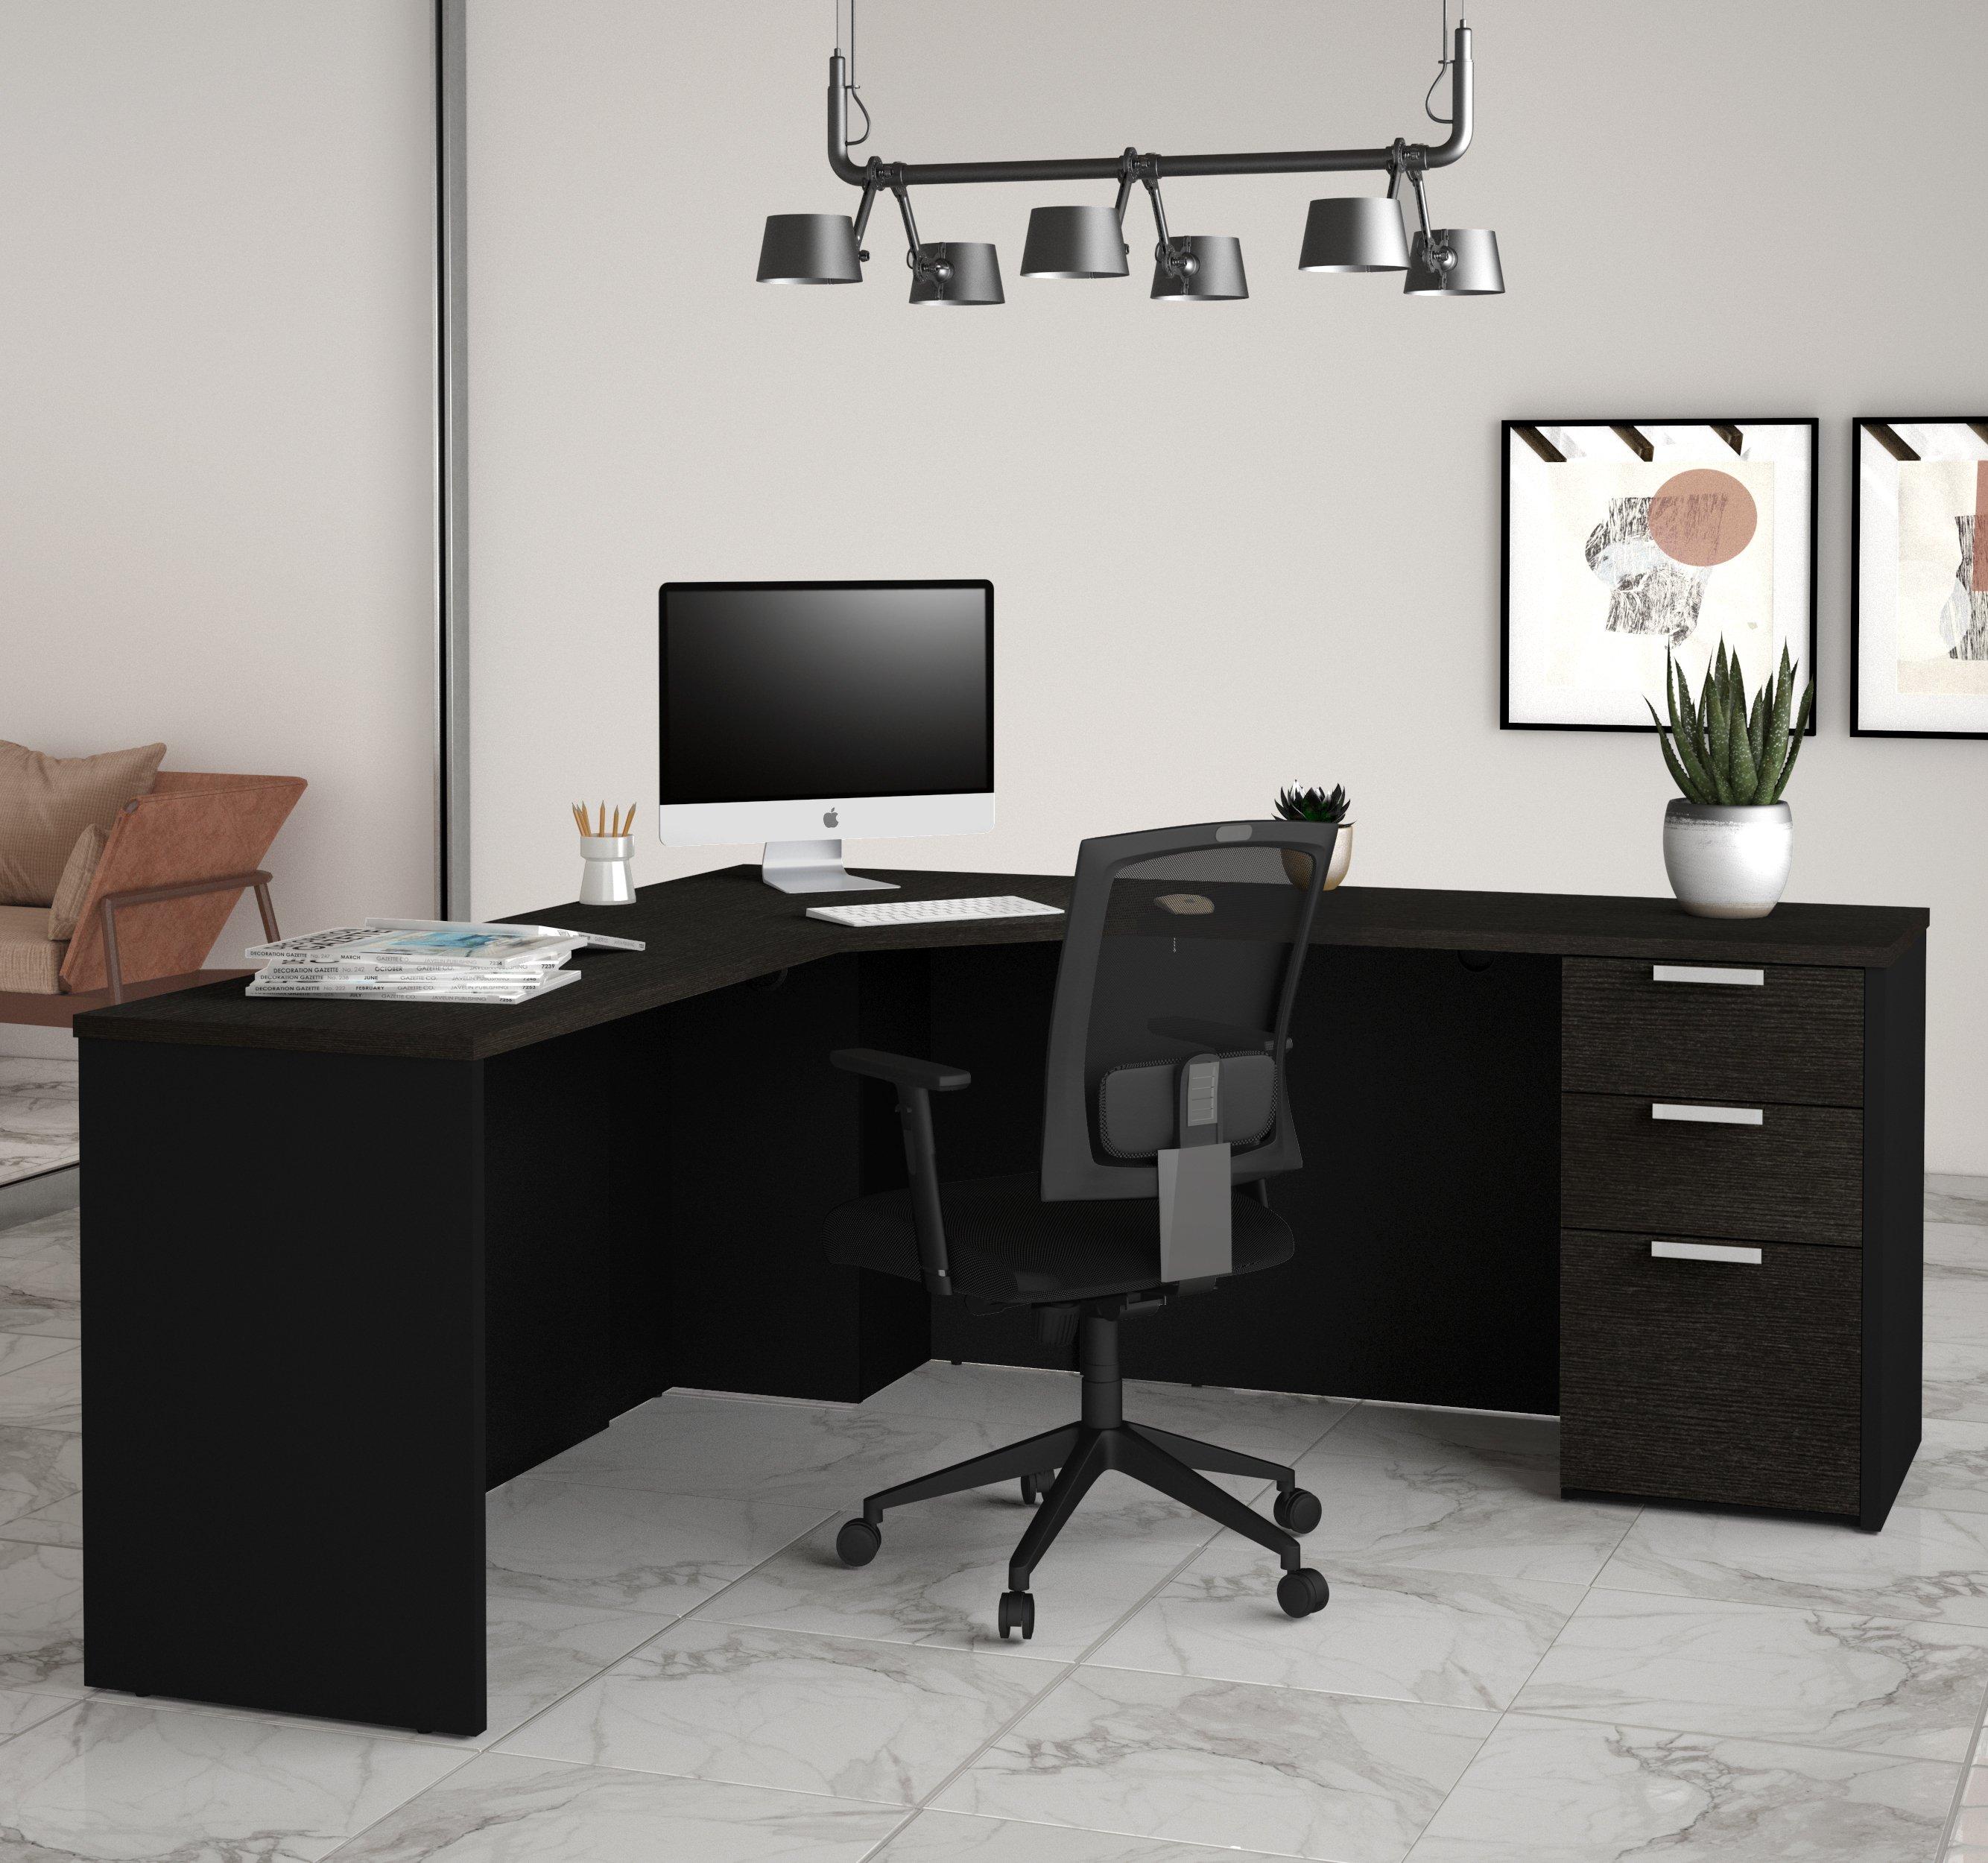 Modern Single Pedestal Corner Desk In Sleek Deep Gray Black Finish Corner Desk Office Organization At Work L Shaped Executive Desk